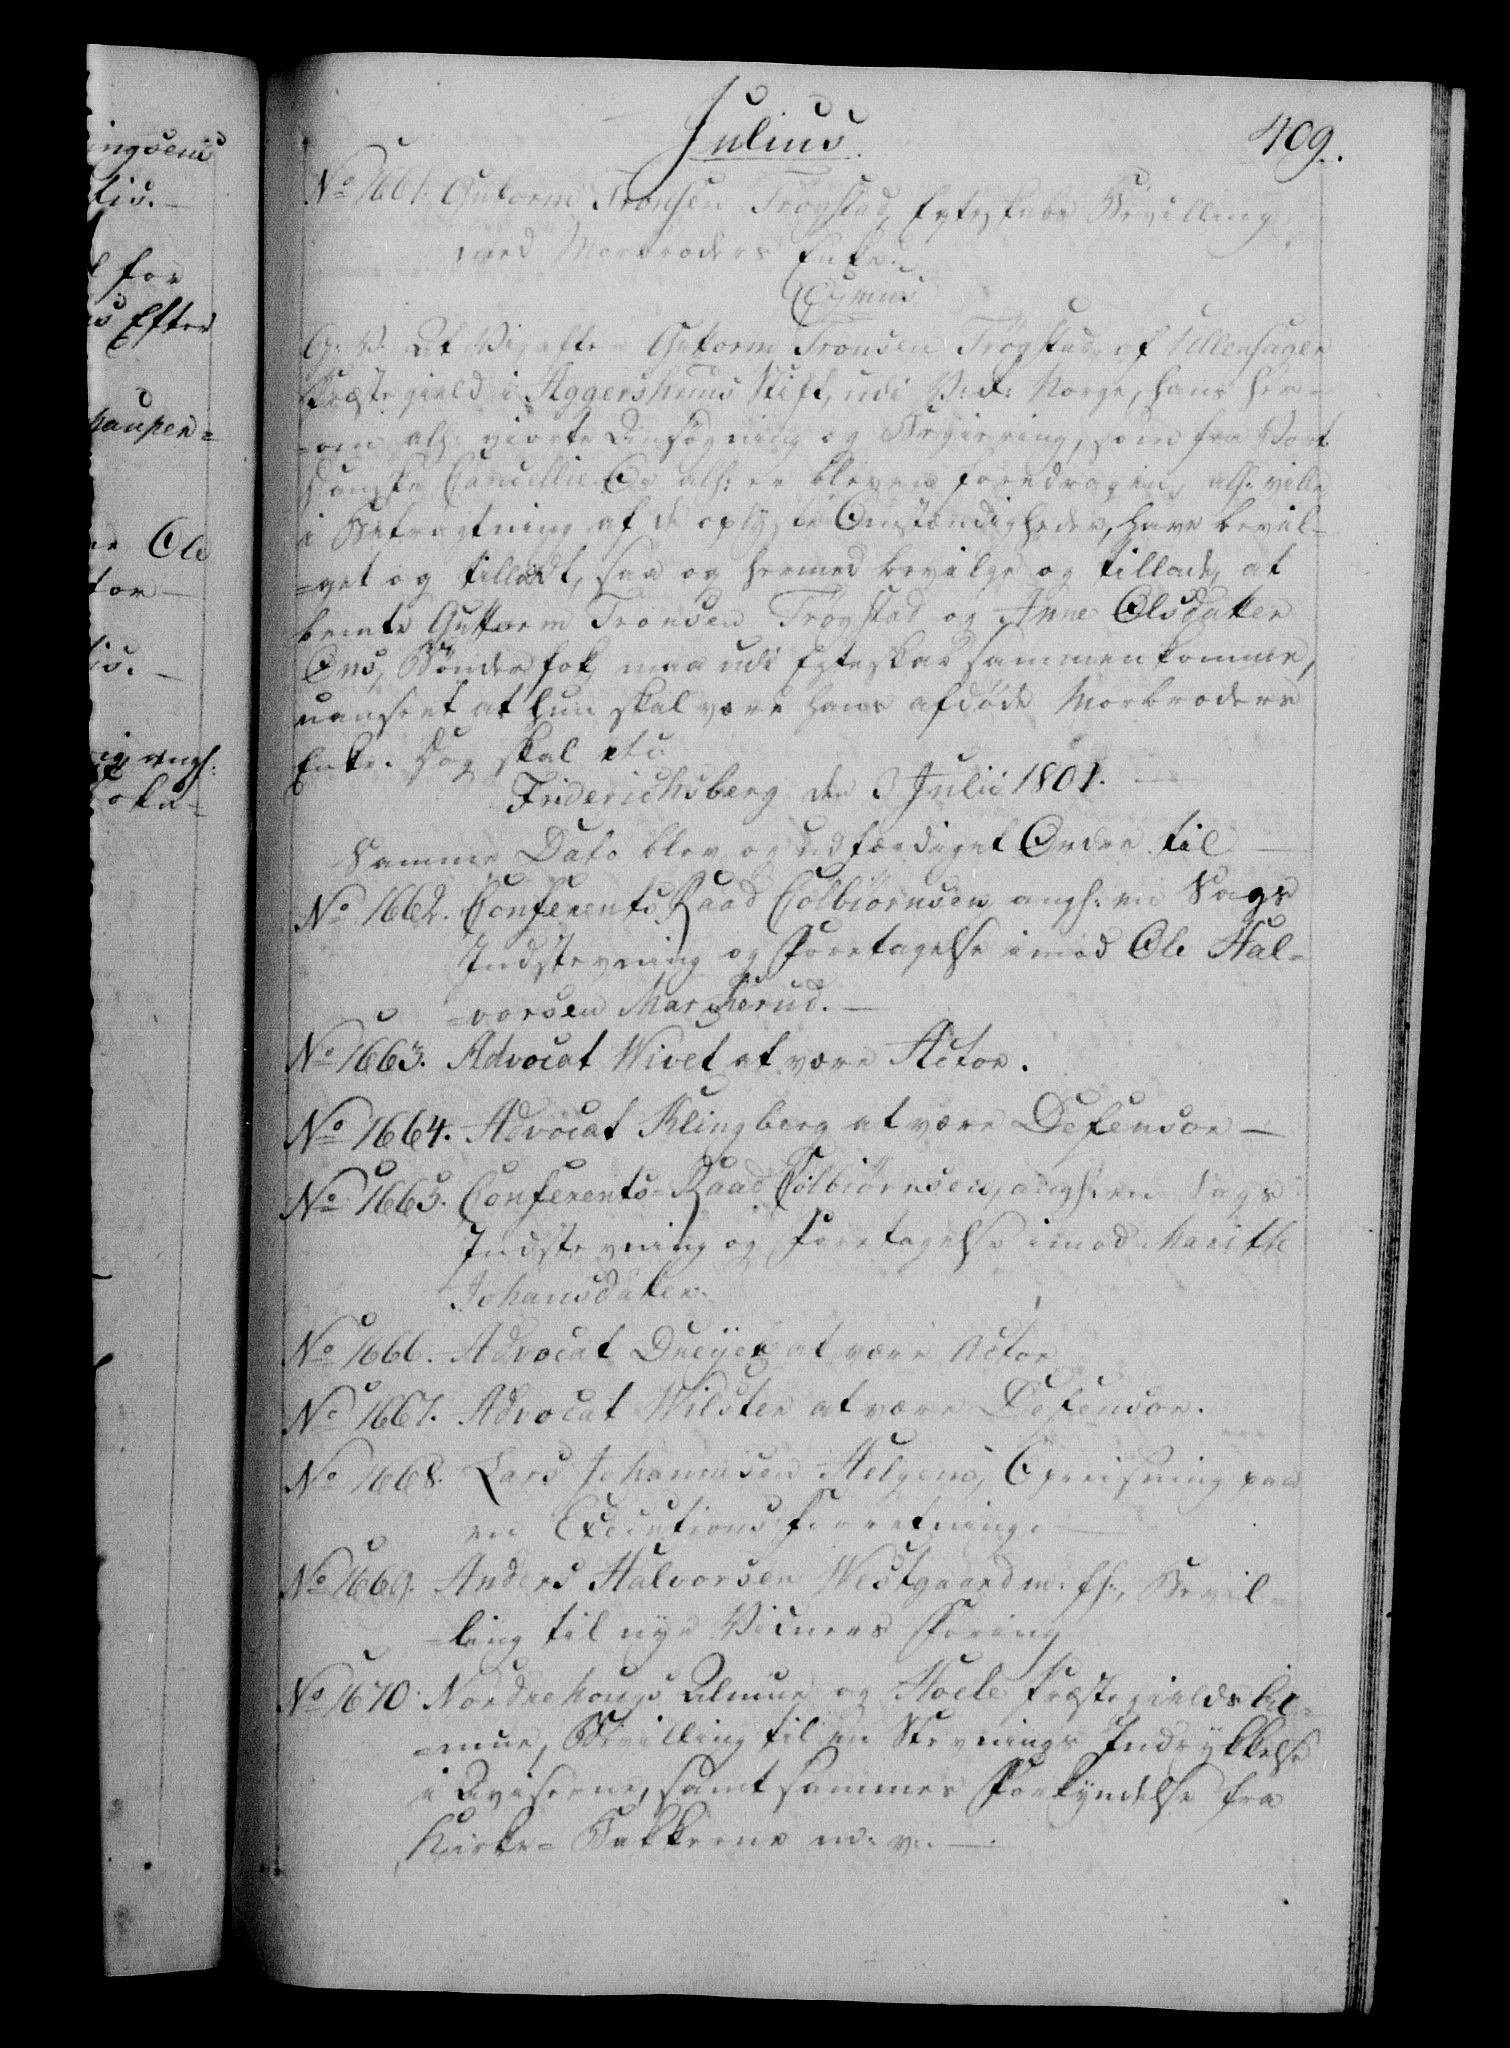 RA, Danske Kanselli 1800-1814, H/Hf/Hfb/Hfba/L0001: Registranter, 1800-1801, s. 409a